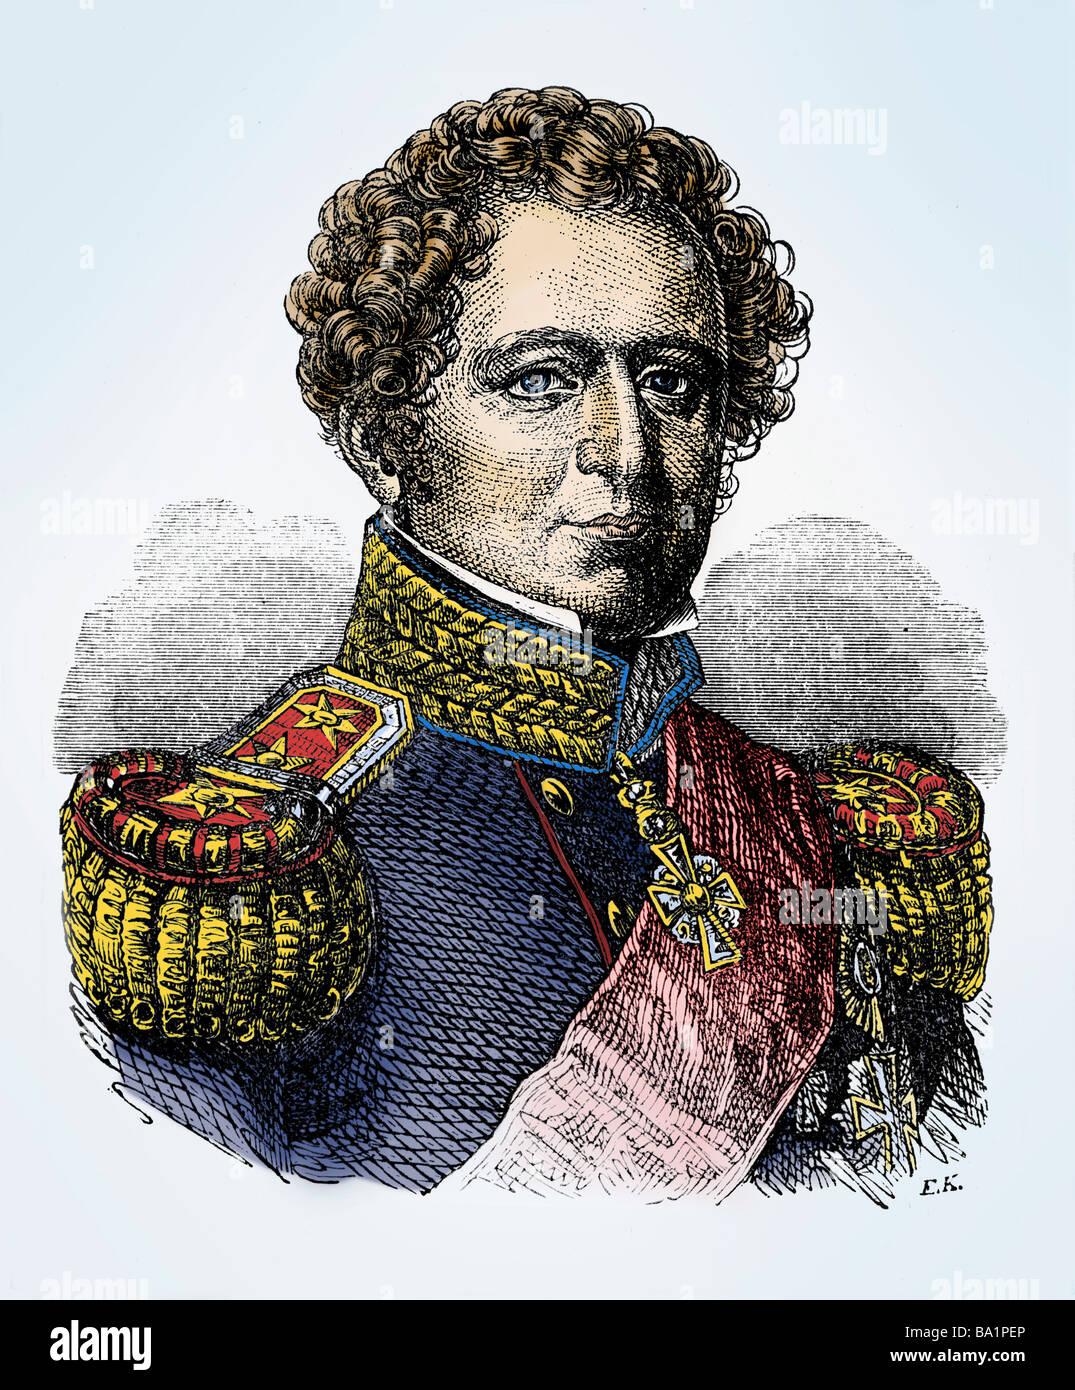 Christian VIII, 18.9.1786 - 20.1.1848, King of Denmark 3.12.1839 - 10.1.1848, portrait, engraving, 19th century, Stock Photo